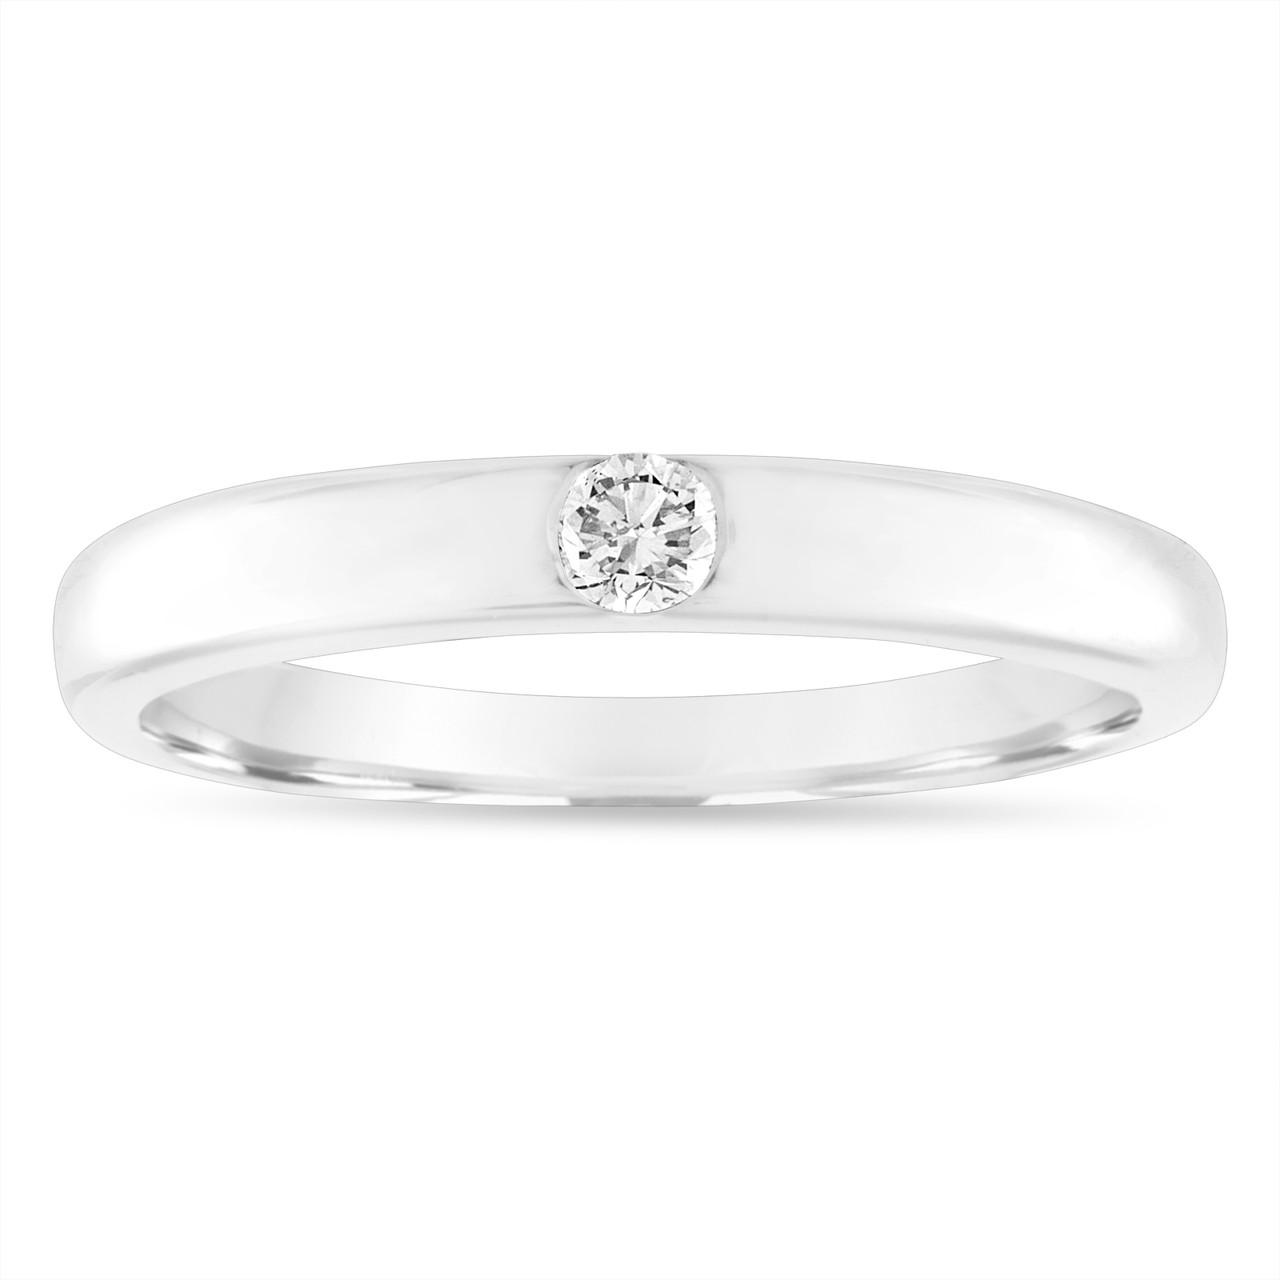 b8111e106ba 0.10 Carat Diamond Wedding Band, Diamond Wedding Ring ...